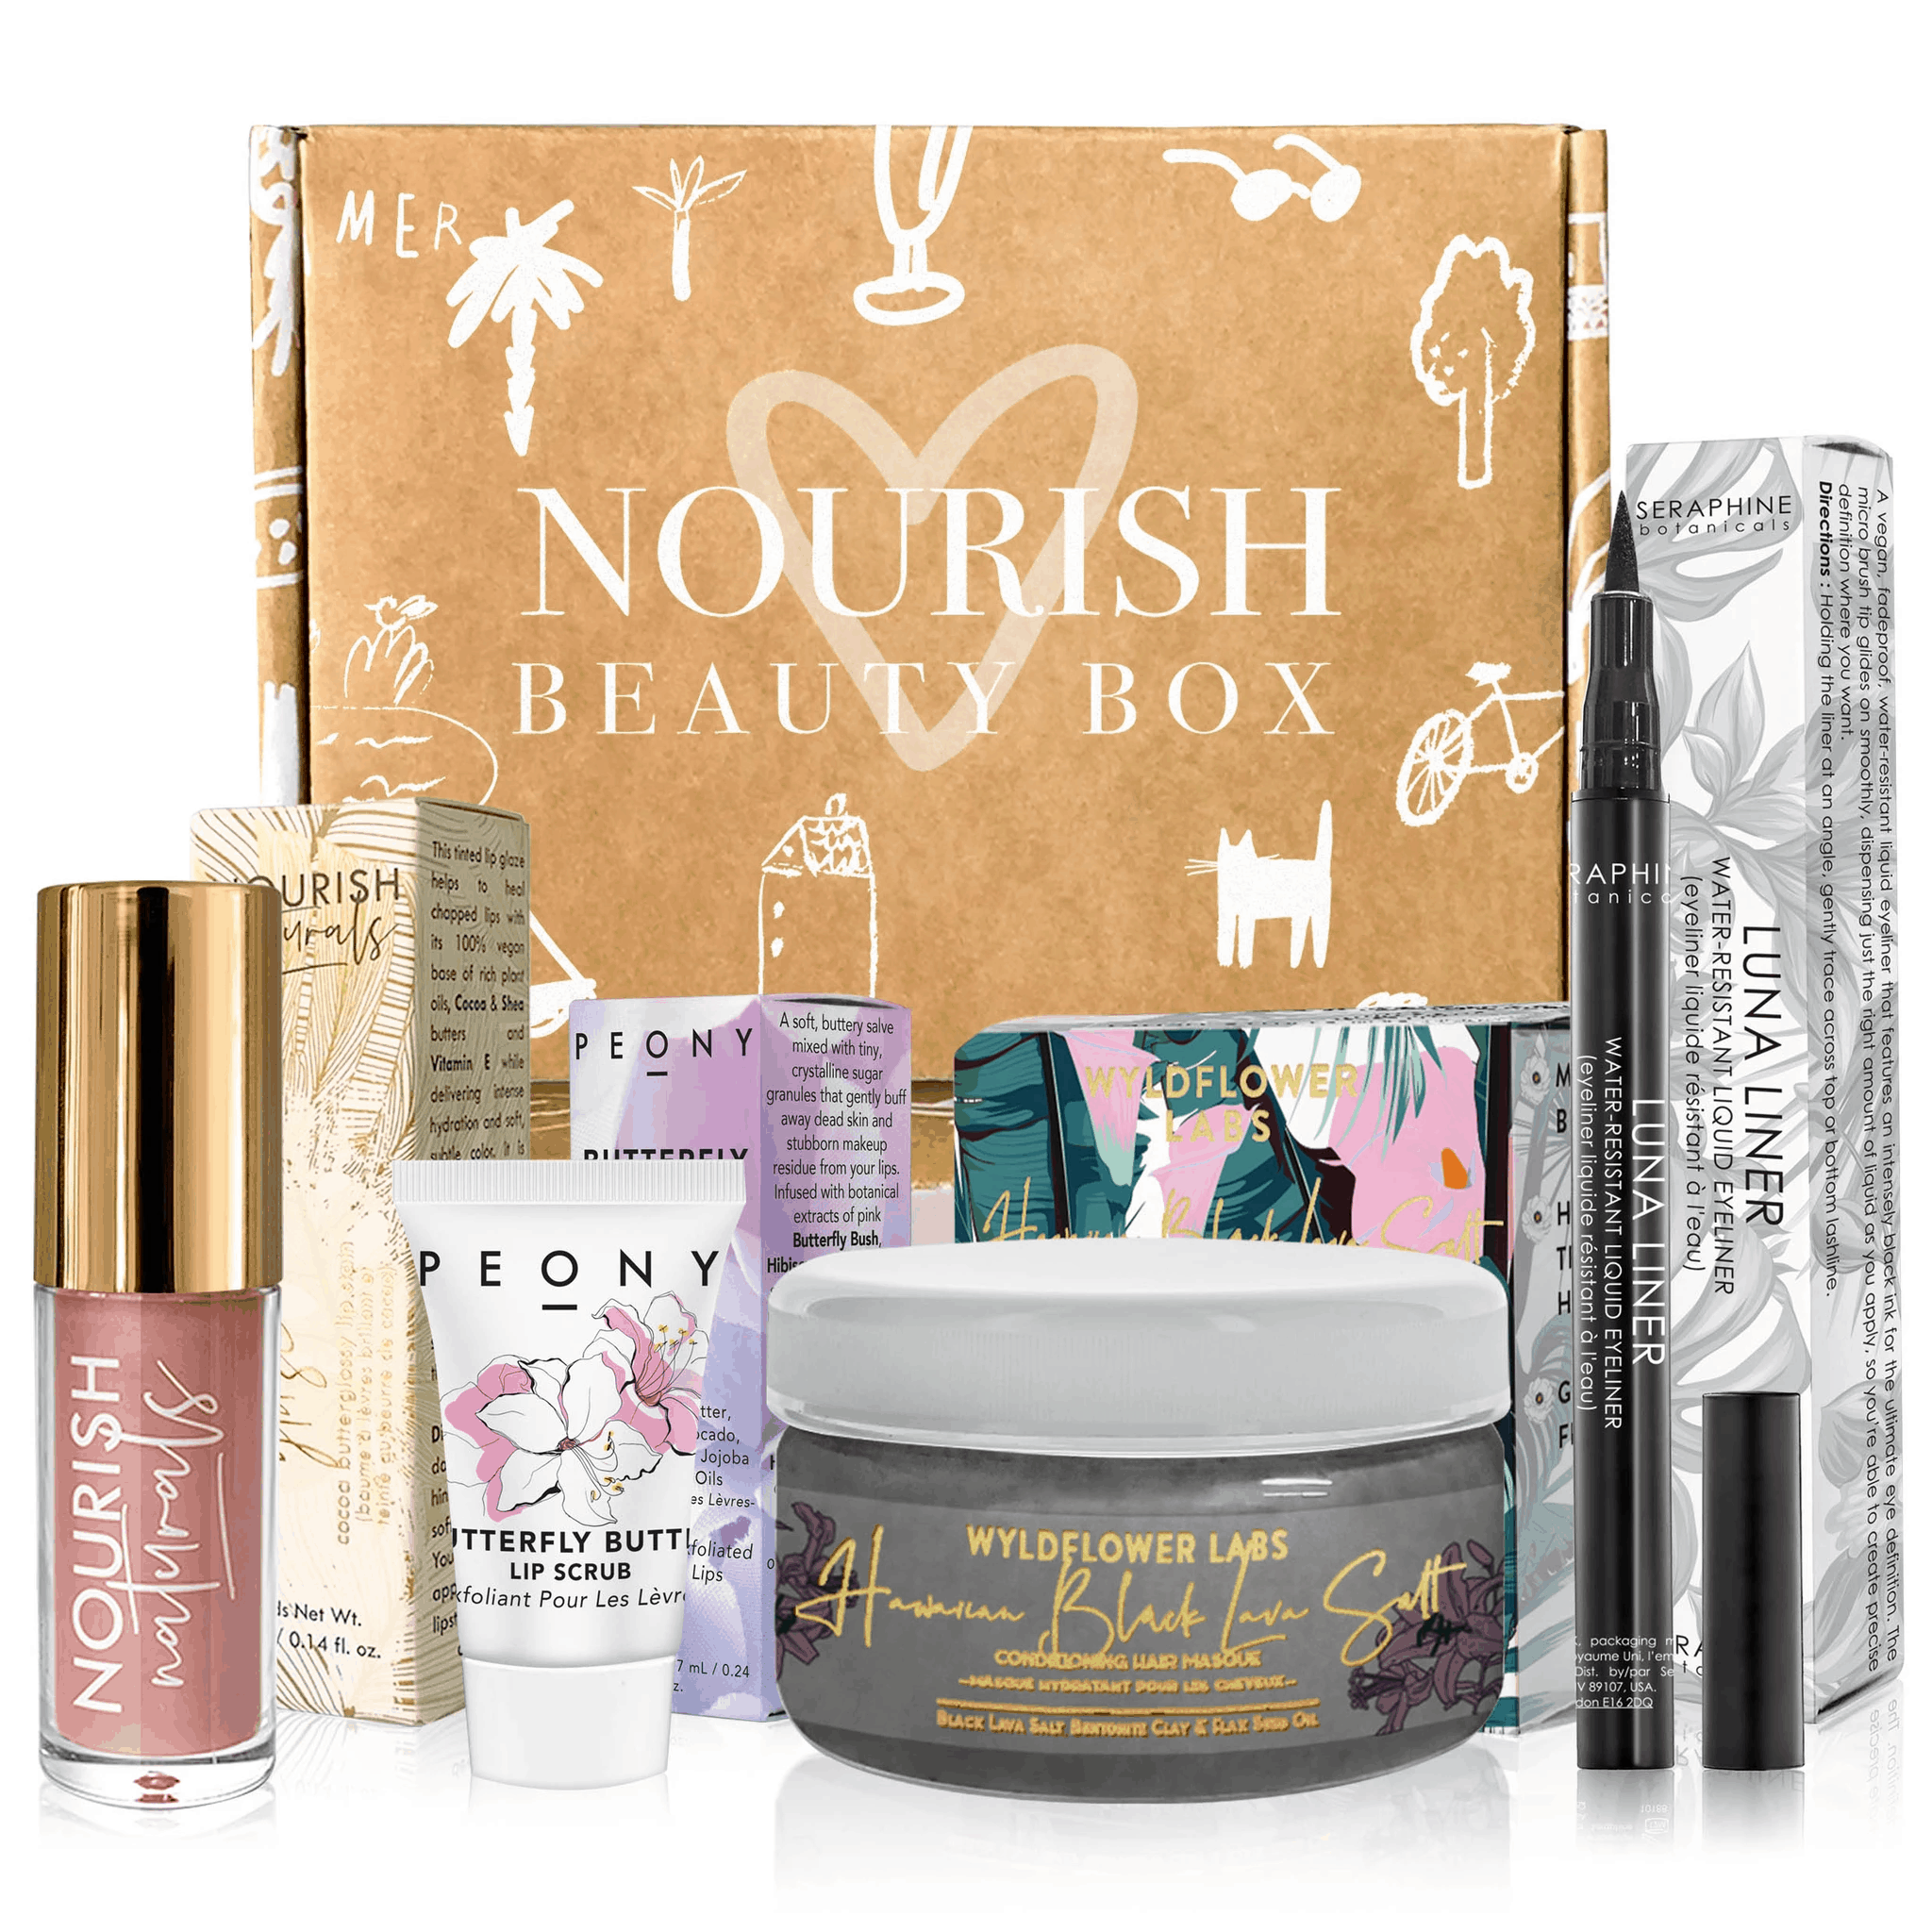 Nourish Beauty Box September 2019 Full Spoilers + Coupon